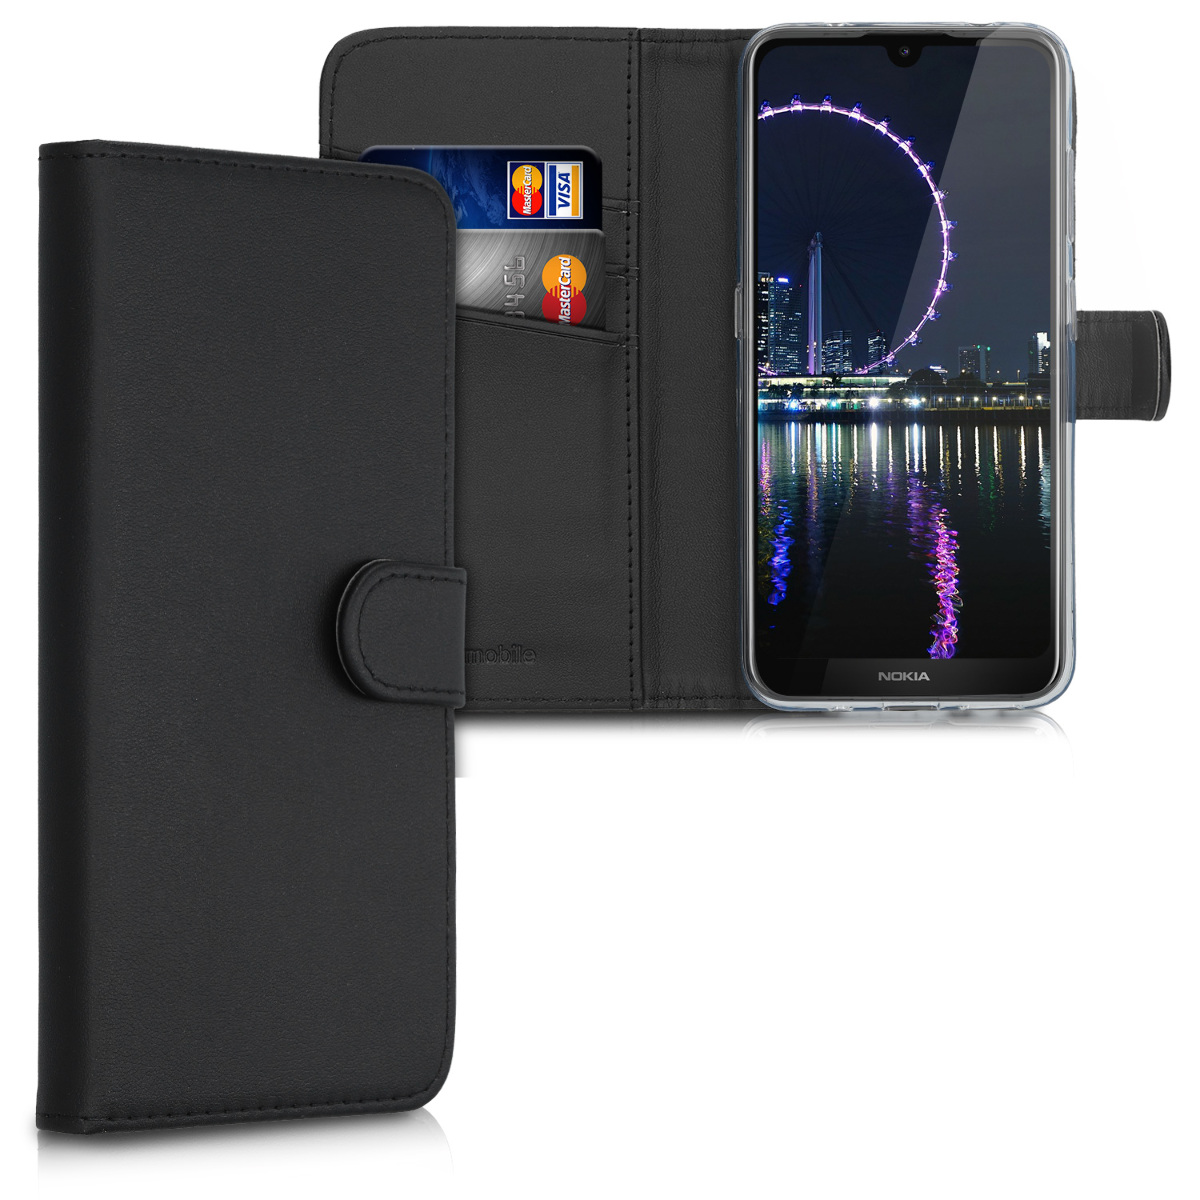 KW Θήκη - Πορτοφόλι Nokia 3.2 - Black (49889.01)